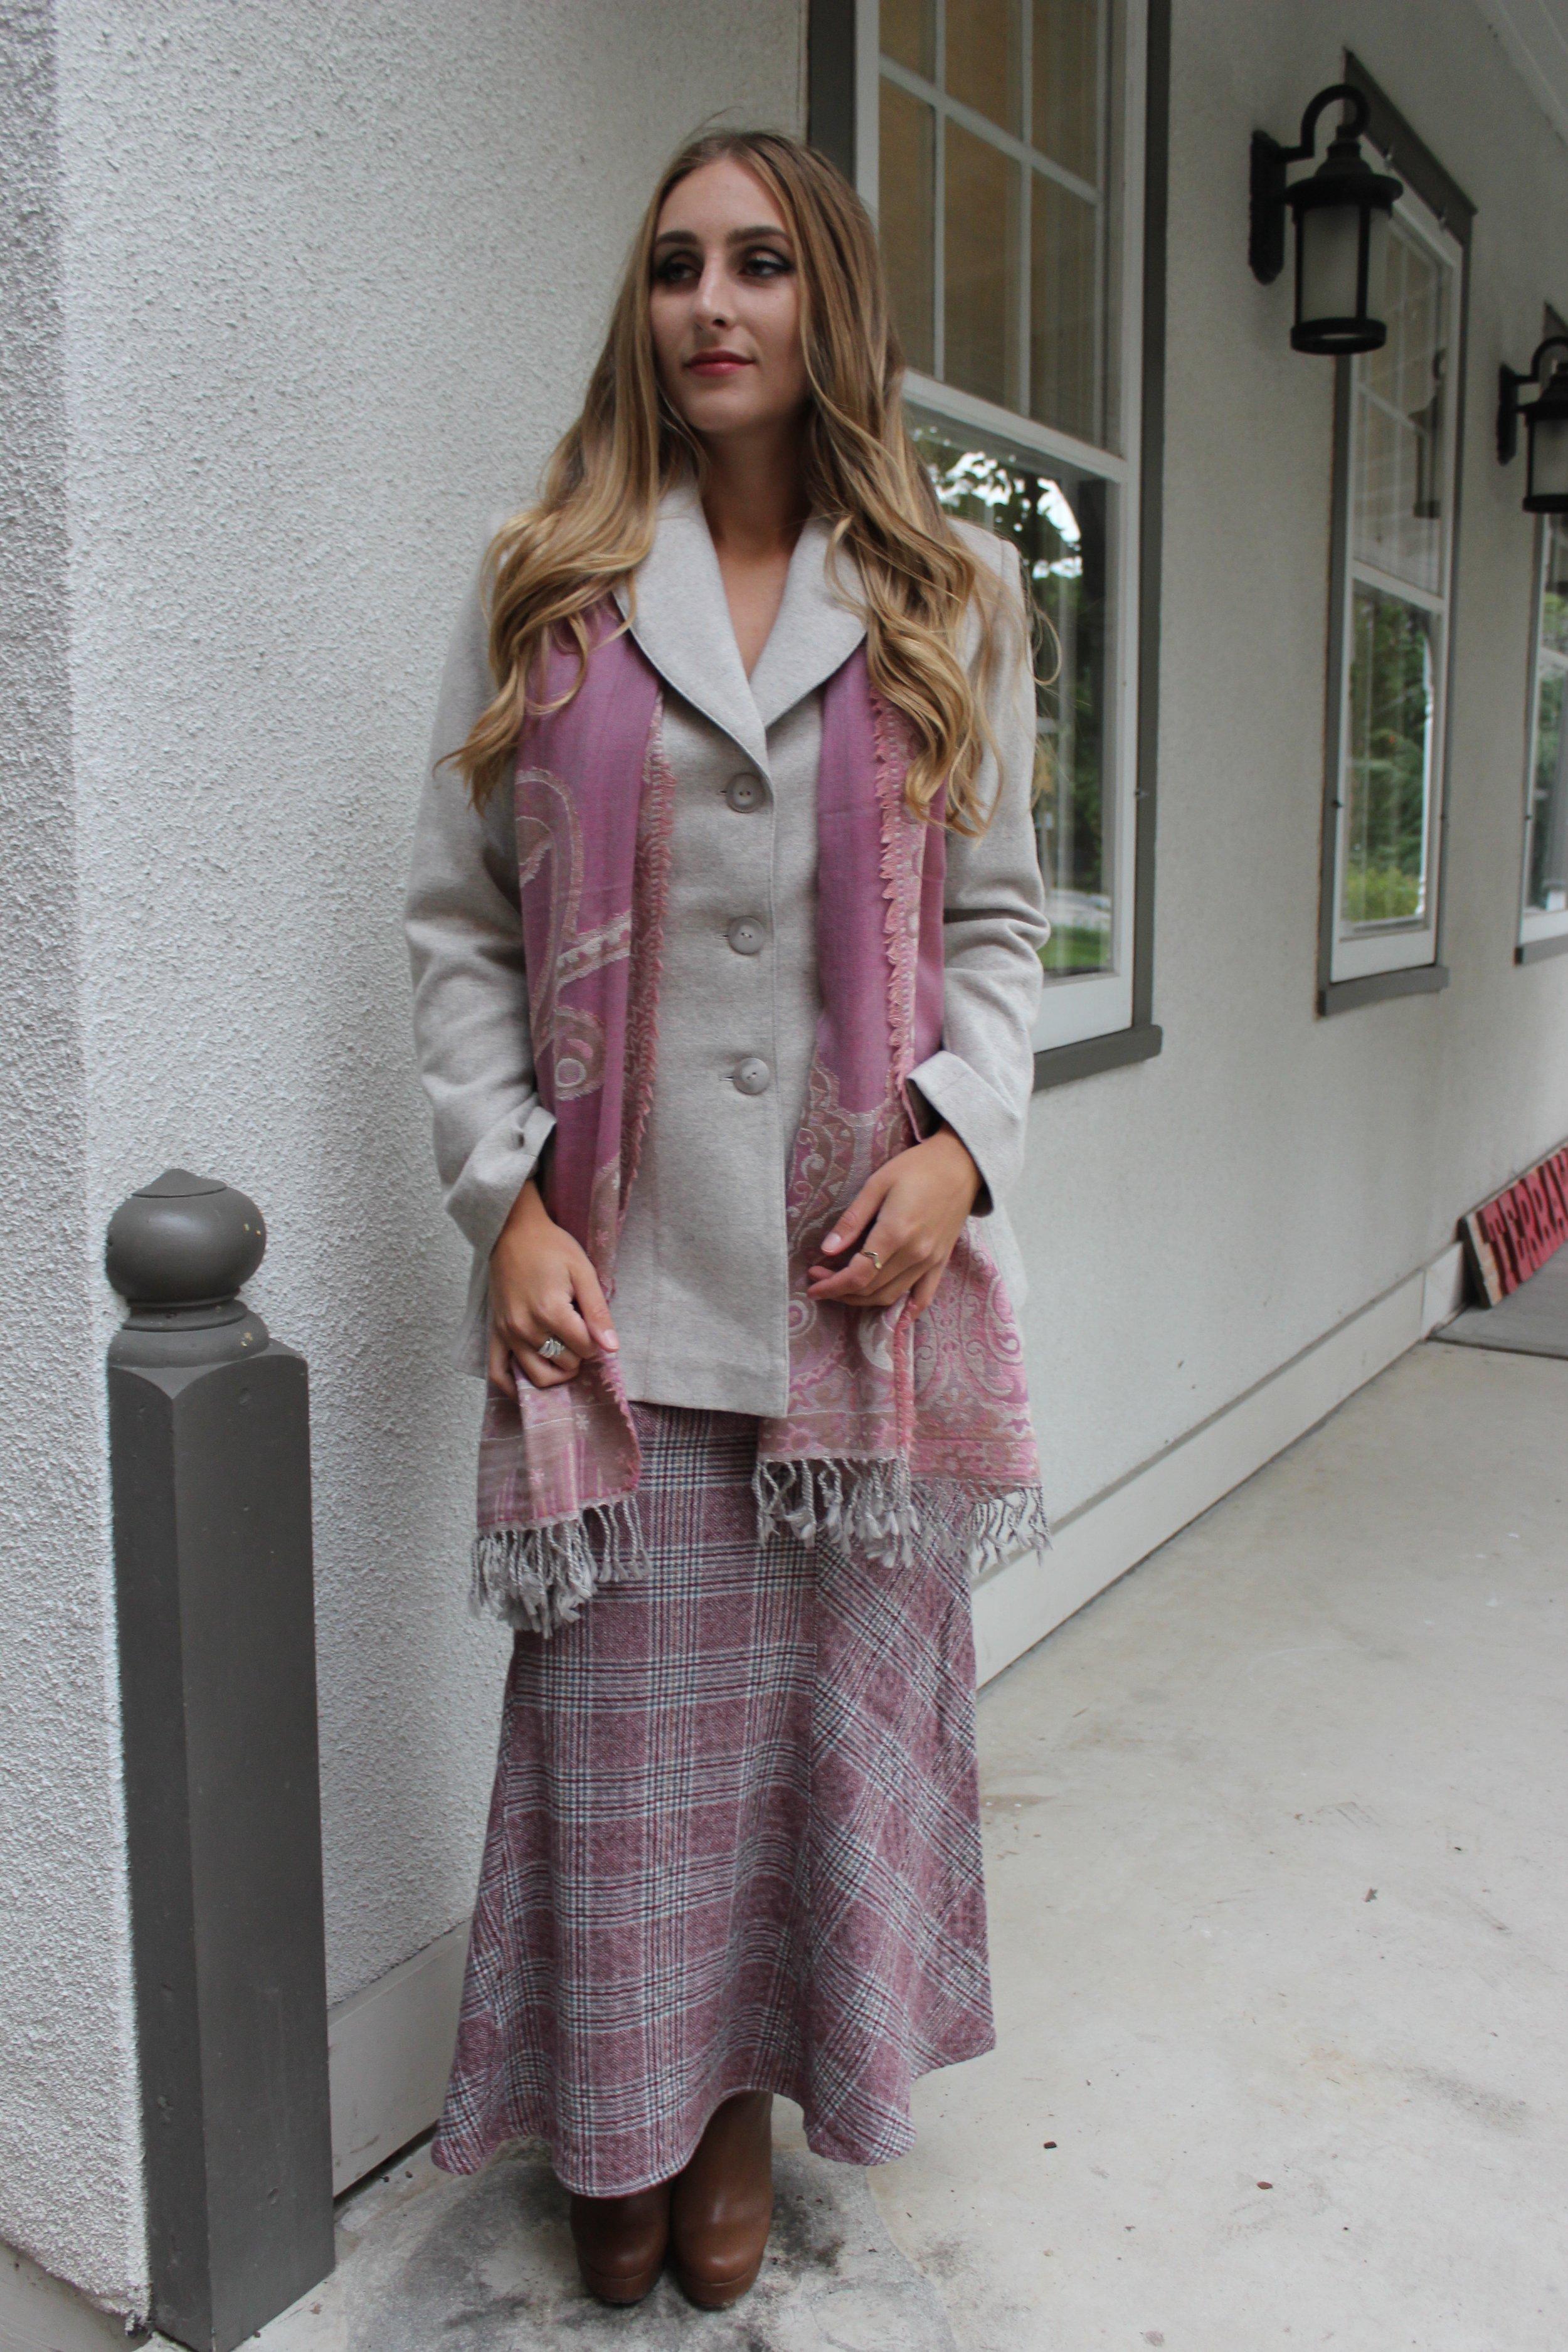 Riding Jacket and Peplum Skirt